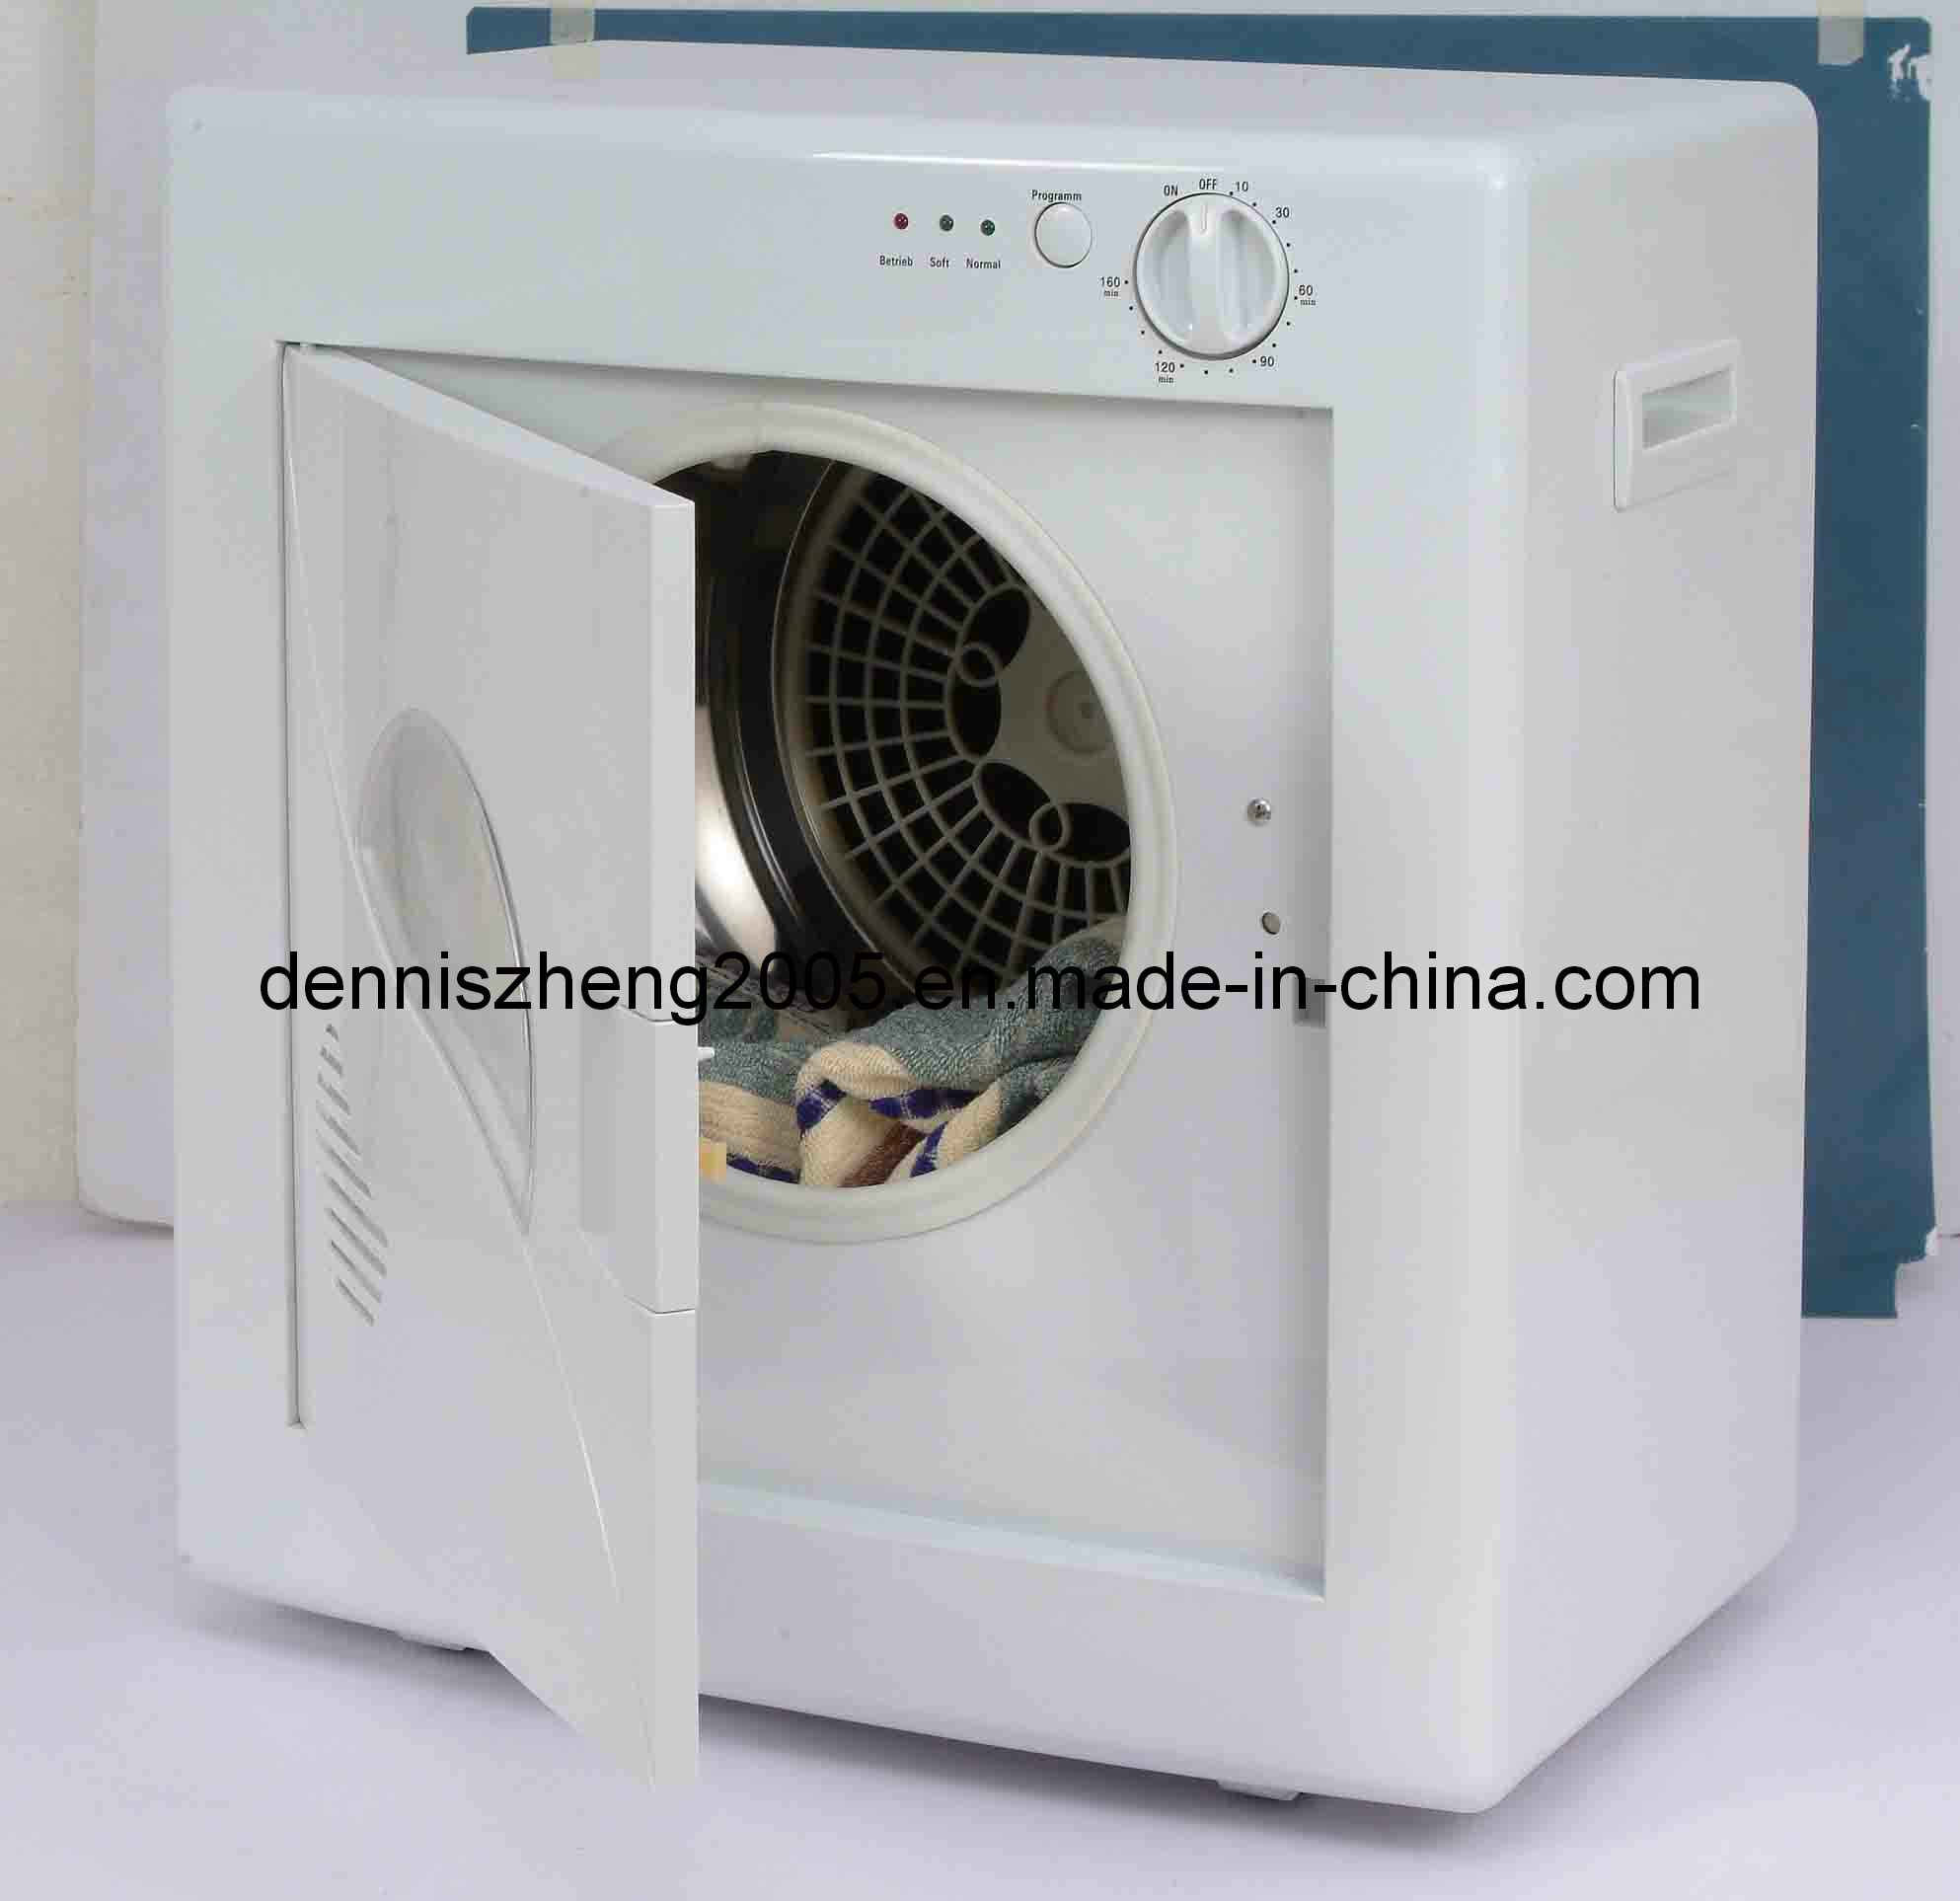 China Mini Clothes Dryer Portable Tumble Dryer China